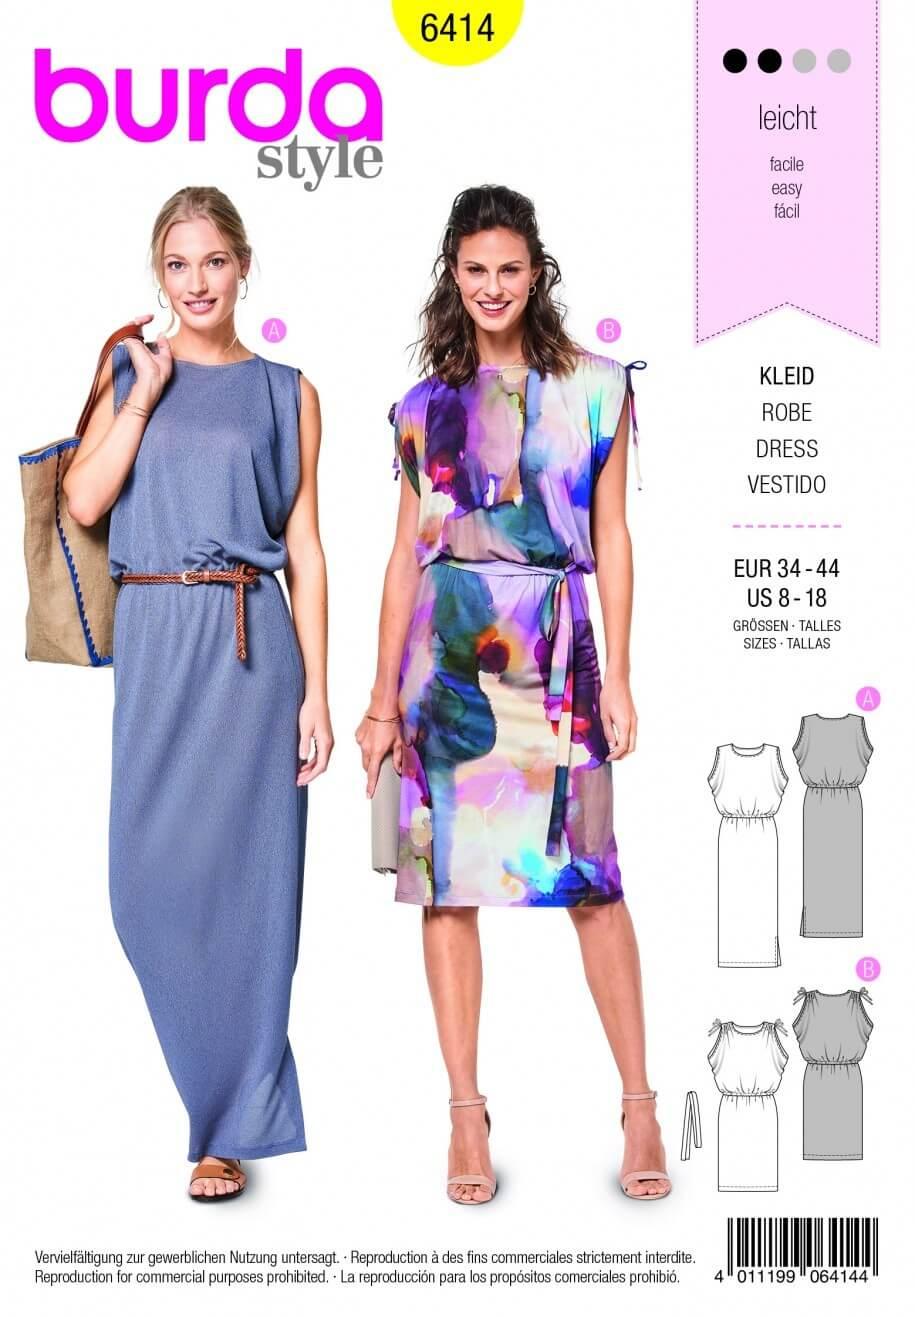 Burda Style Long Short Sleeveless Summer Dress Fabric Sewing Pattern 6414